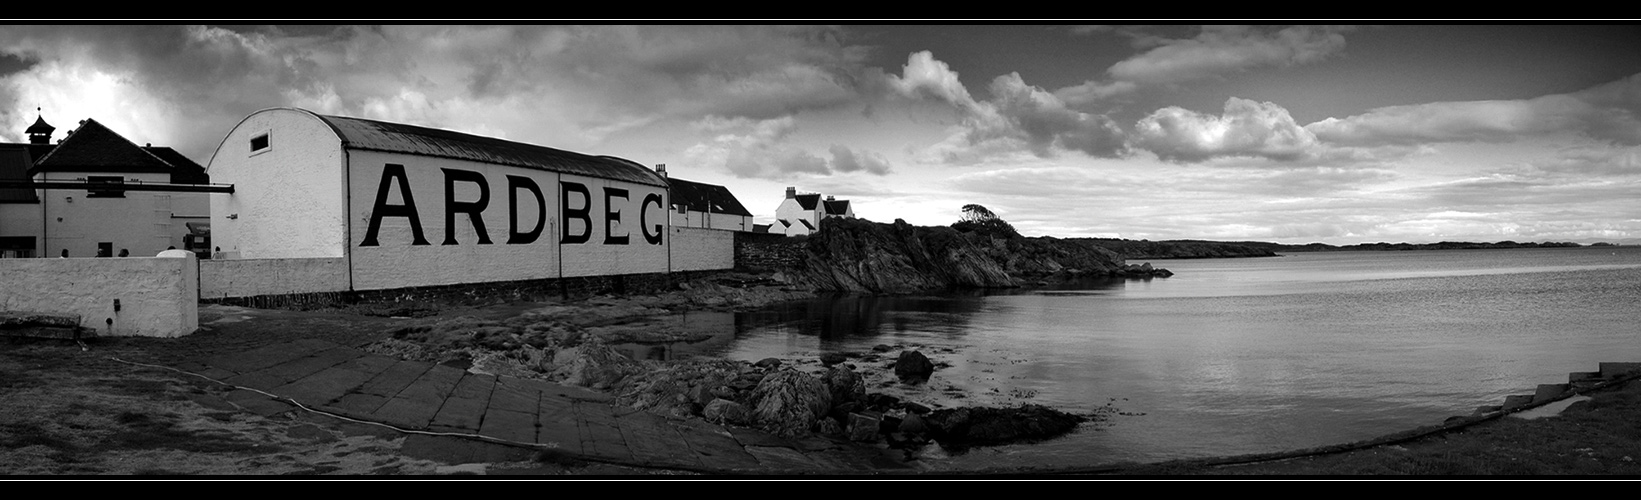 Ardbeg Distillery - Isle of Islay -